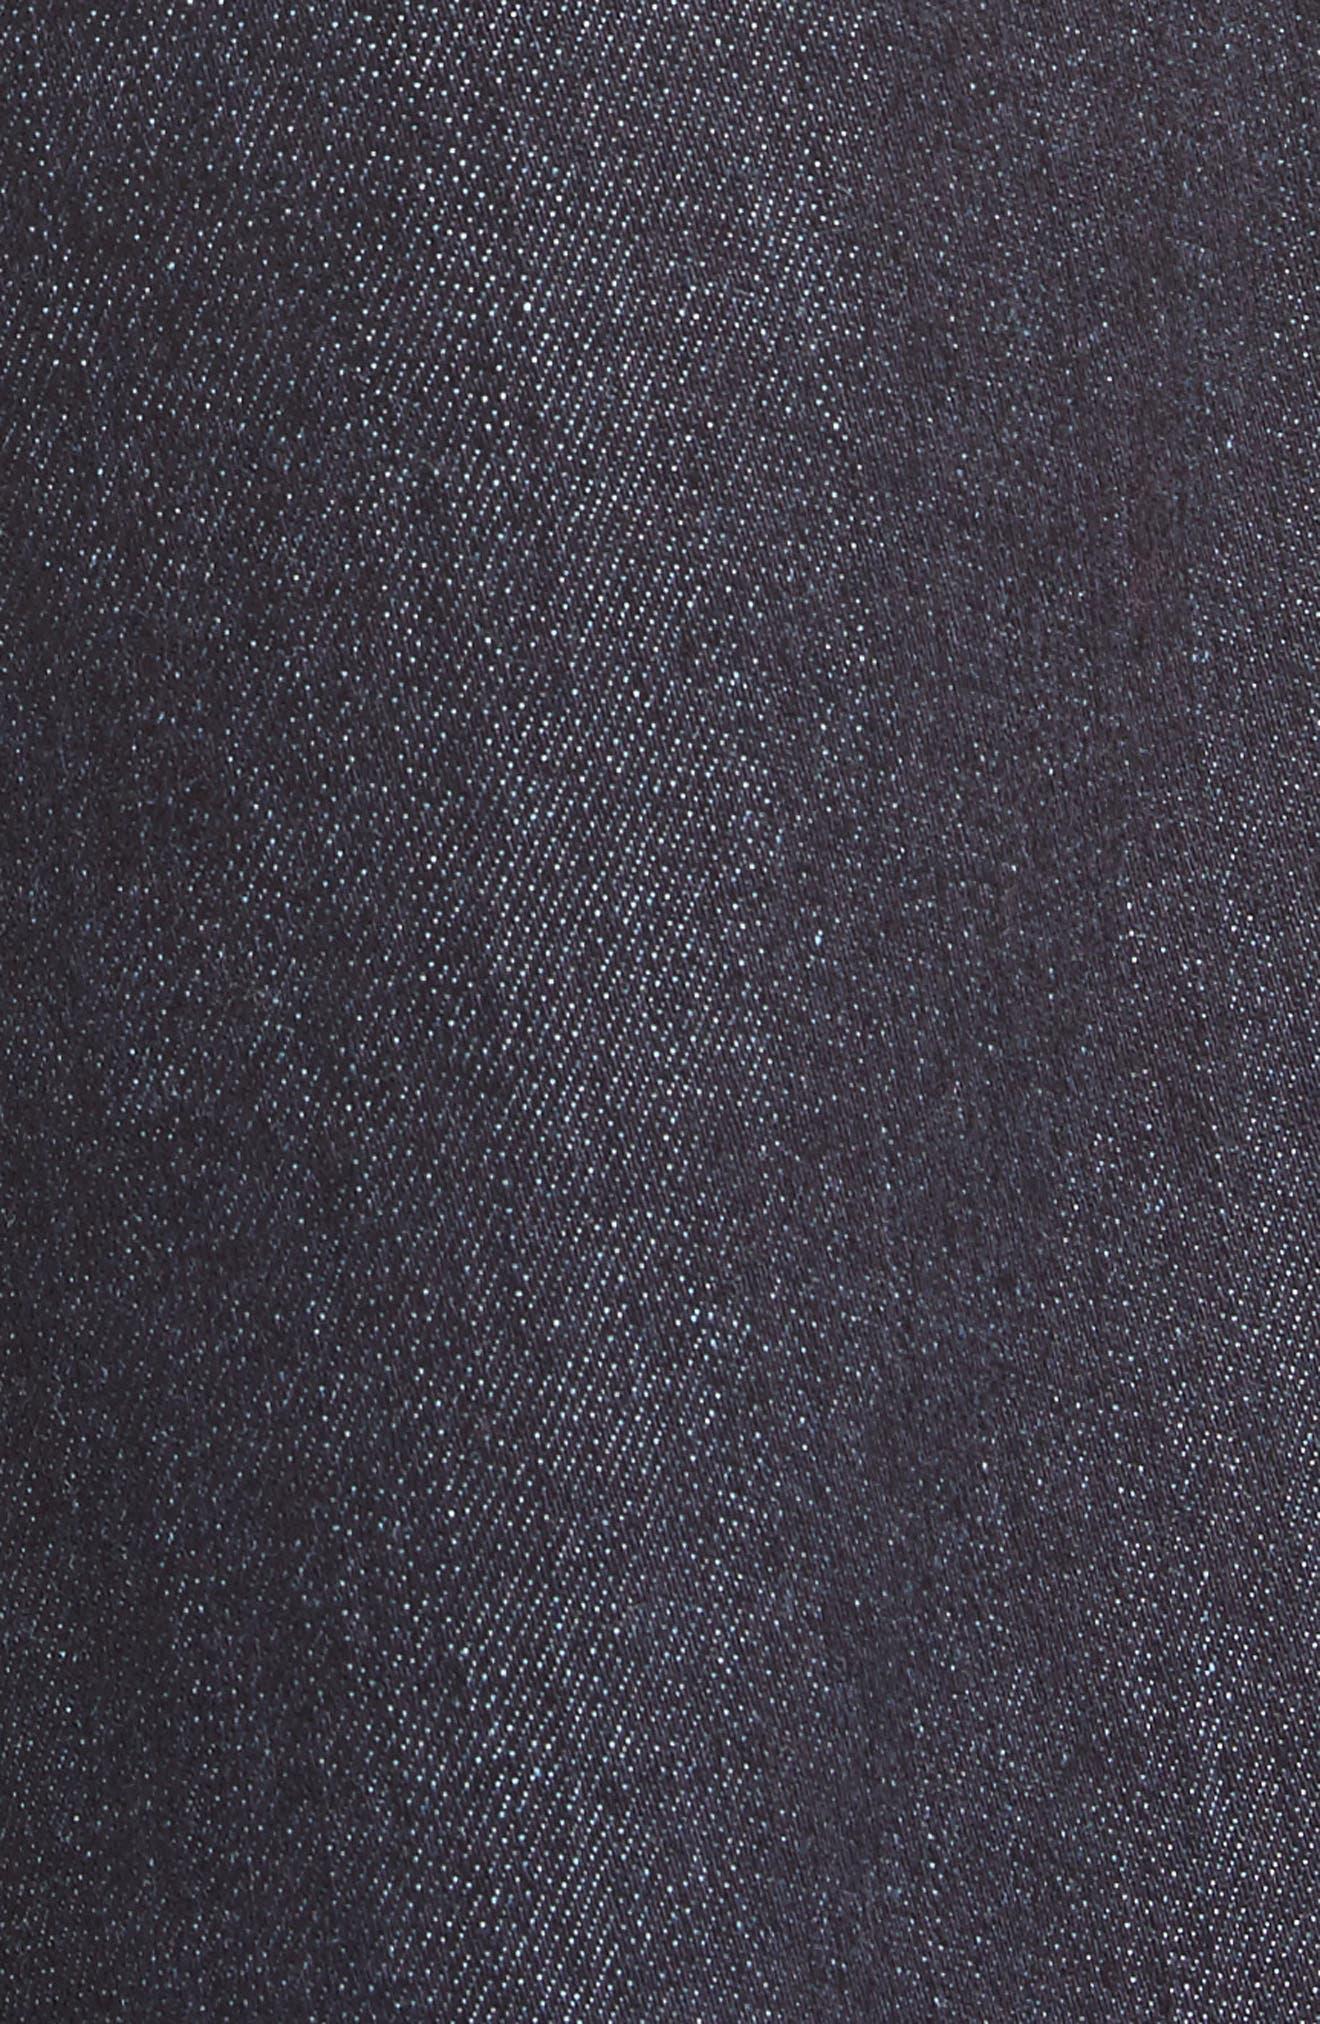 Sam High Waist Culotte Jeans,                             Alternate thumbnail 5, color,                             401